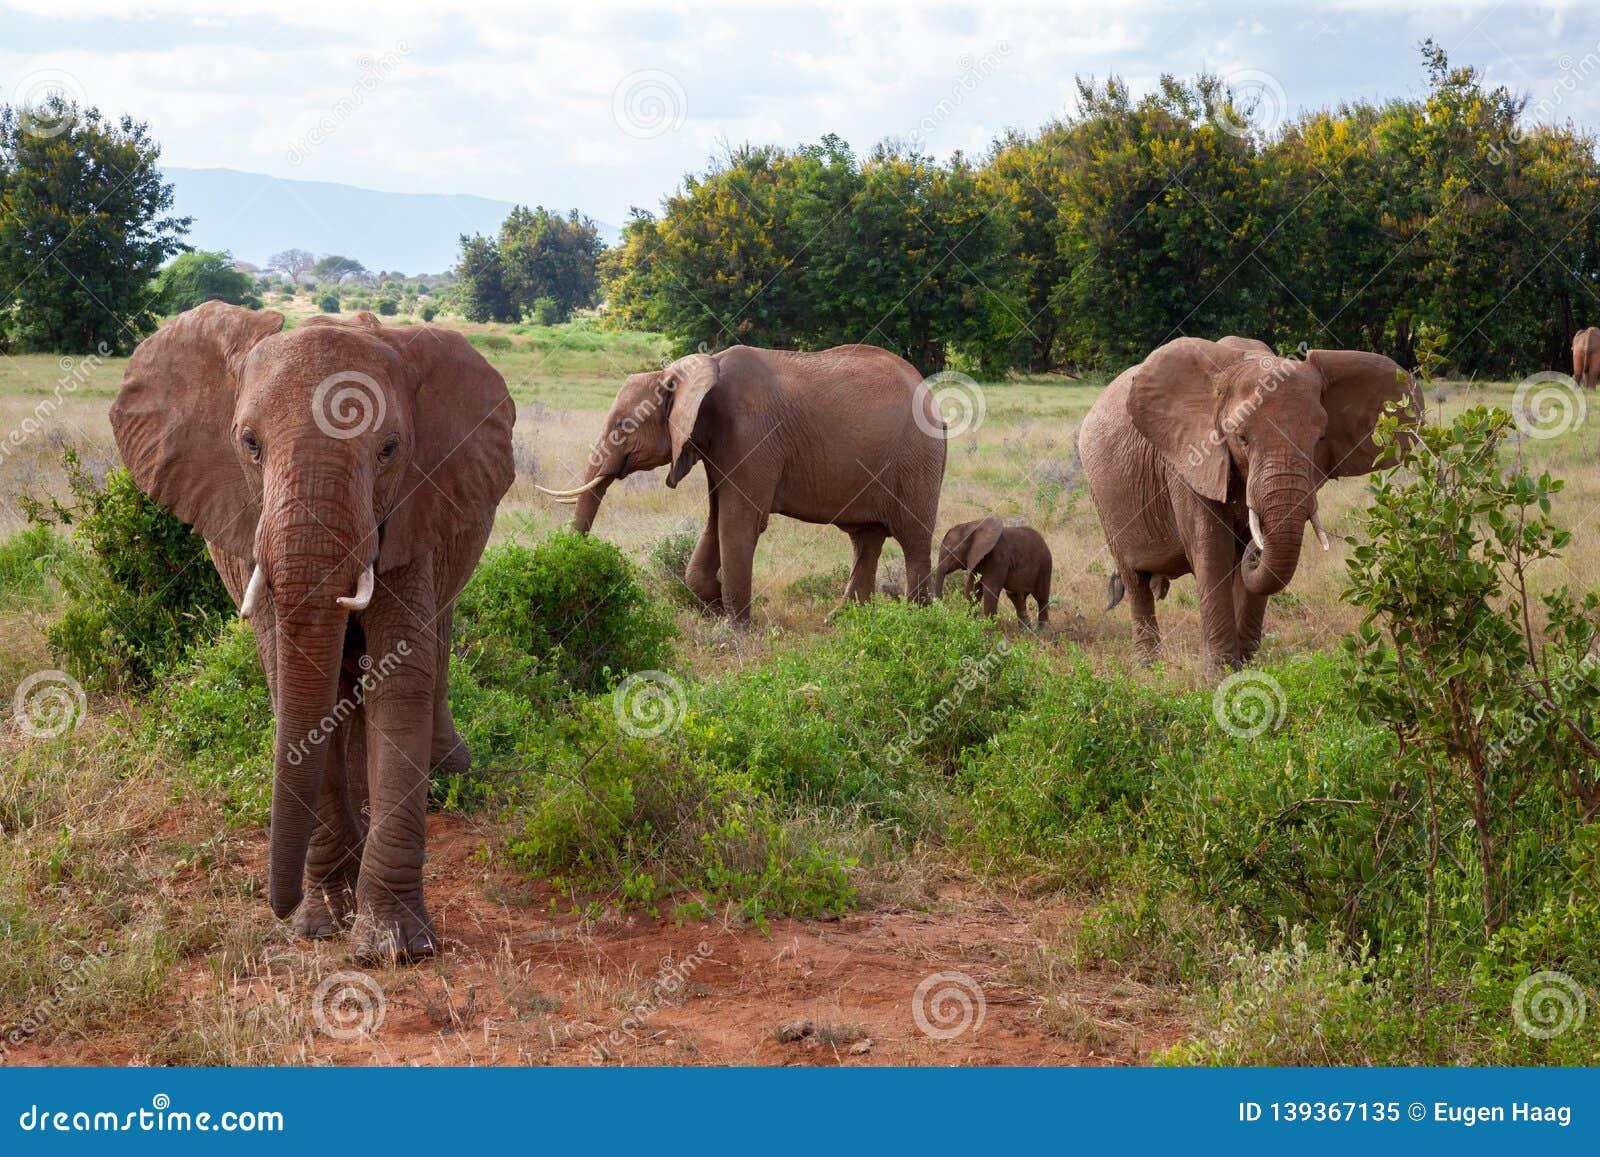 A elephant family in the bush of the samburu national park